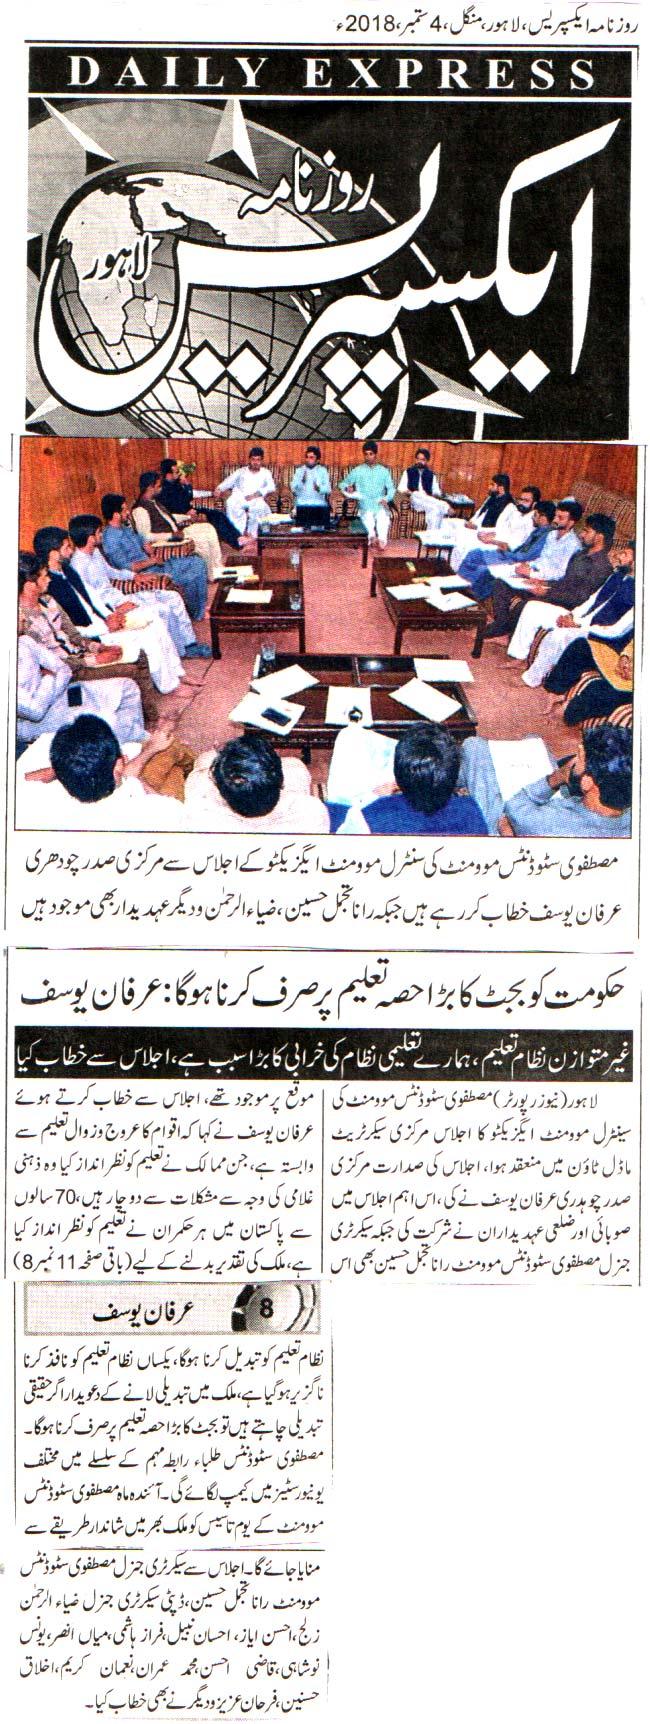 تحریک منہاج القرآن Minhaj-ul-Quran  Print Media Coverage پرنٹ میڈیا کوریج DAILY EXPERSS CITY PAGE